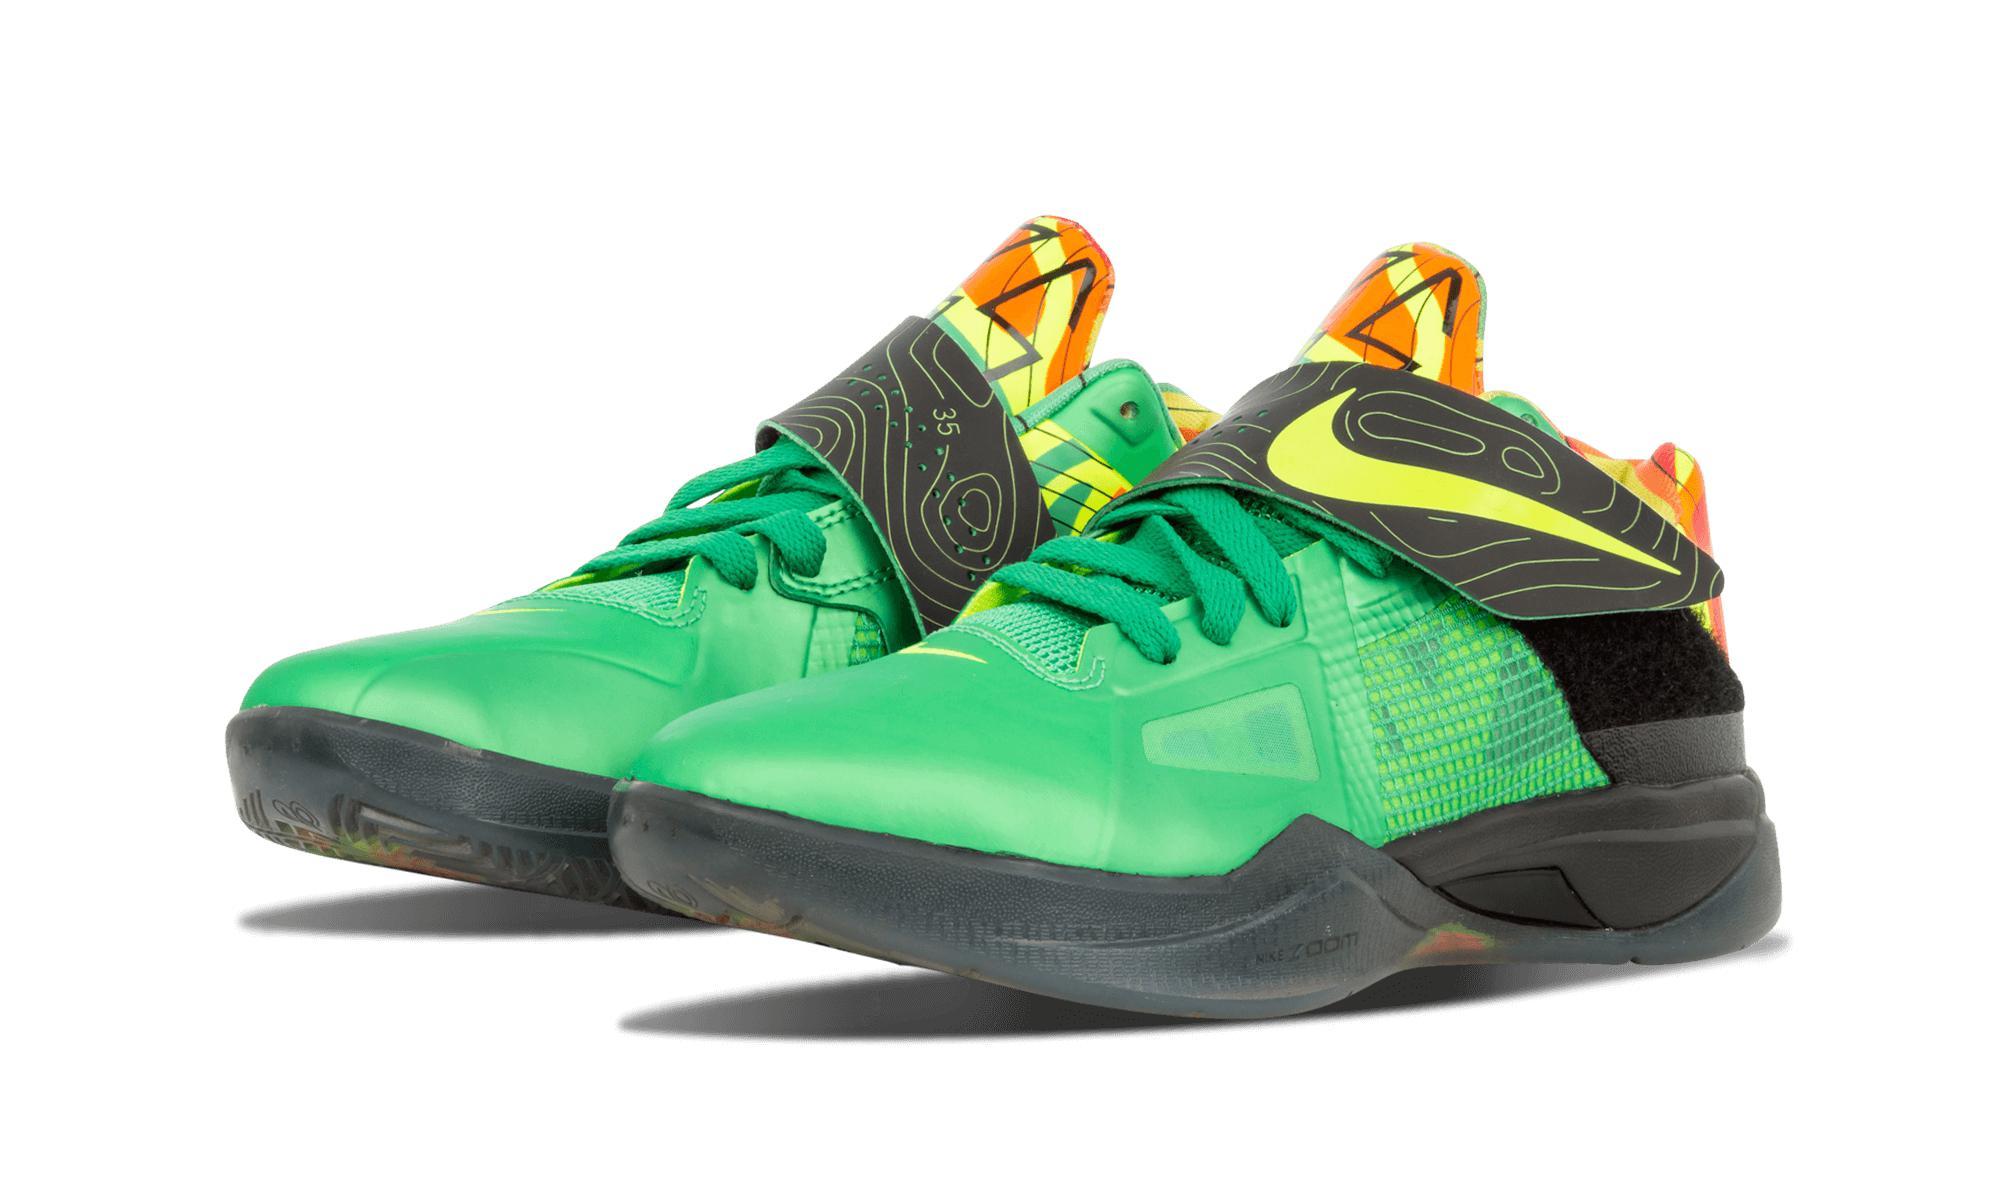 f37a1f91ebe Nike - Green Zoom Kd 4 for Men - Lyst. View fullscreen